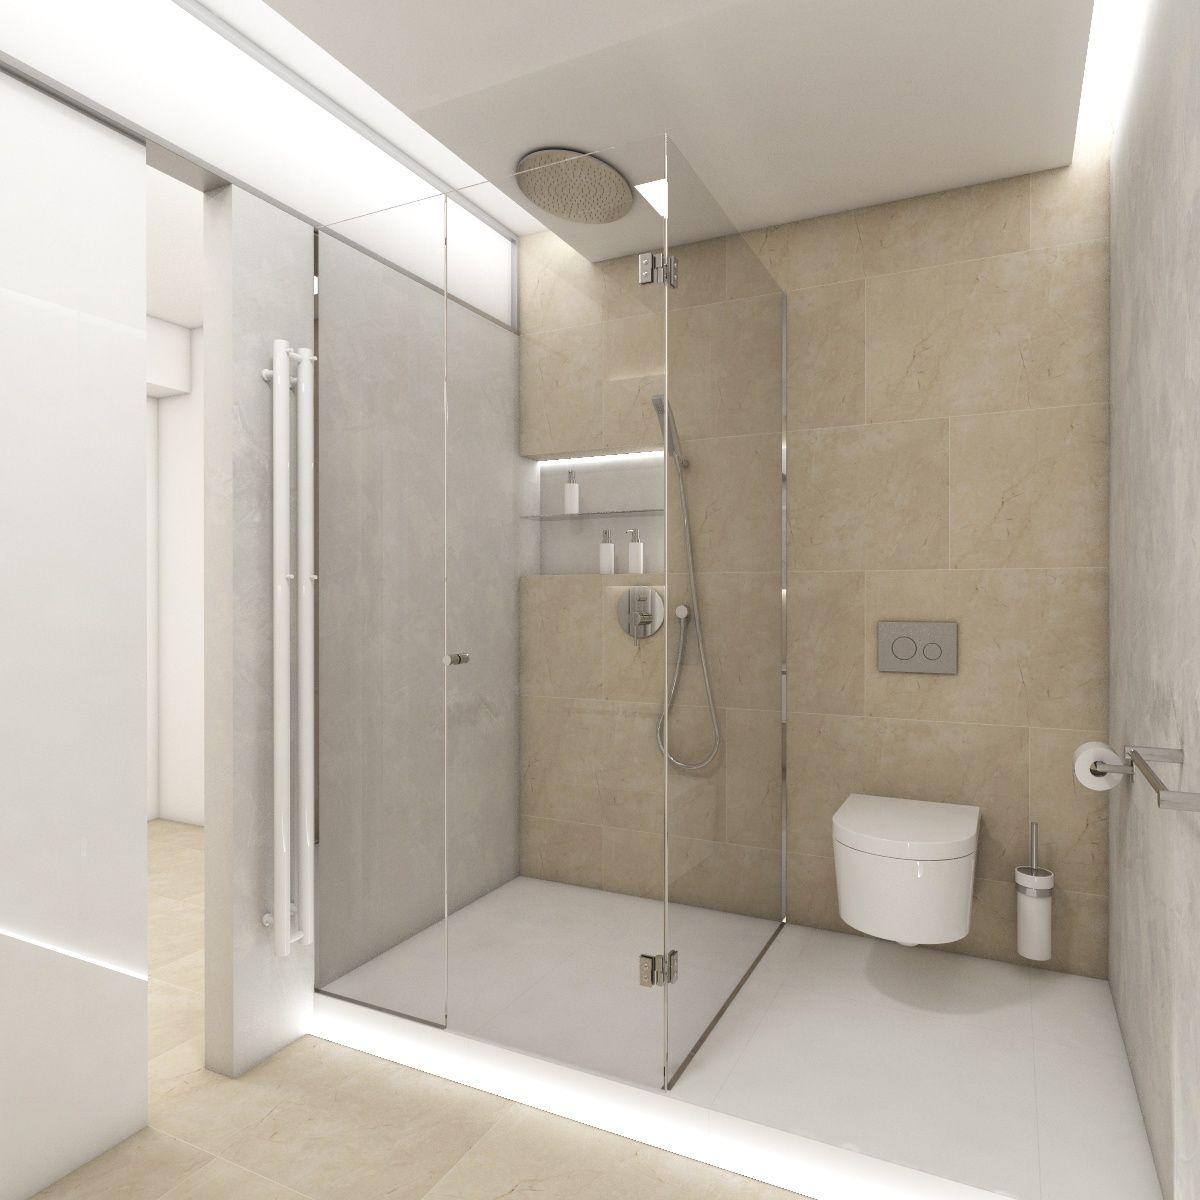 Meuble Salle De Bain Halo Nouveau Image Modern Koupelna Halo Pohled Od Umyvadla Ke Vstupu